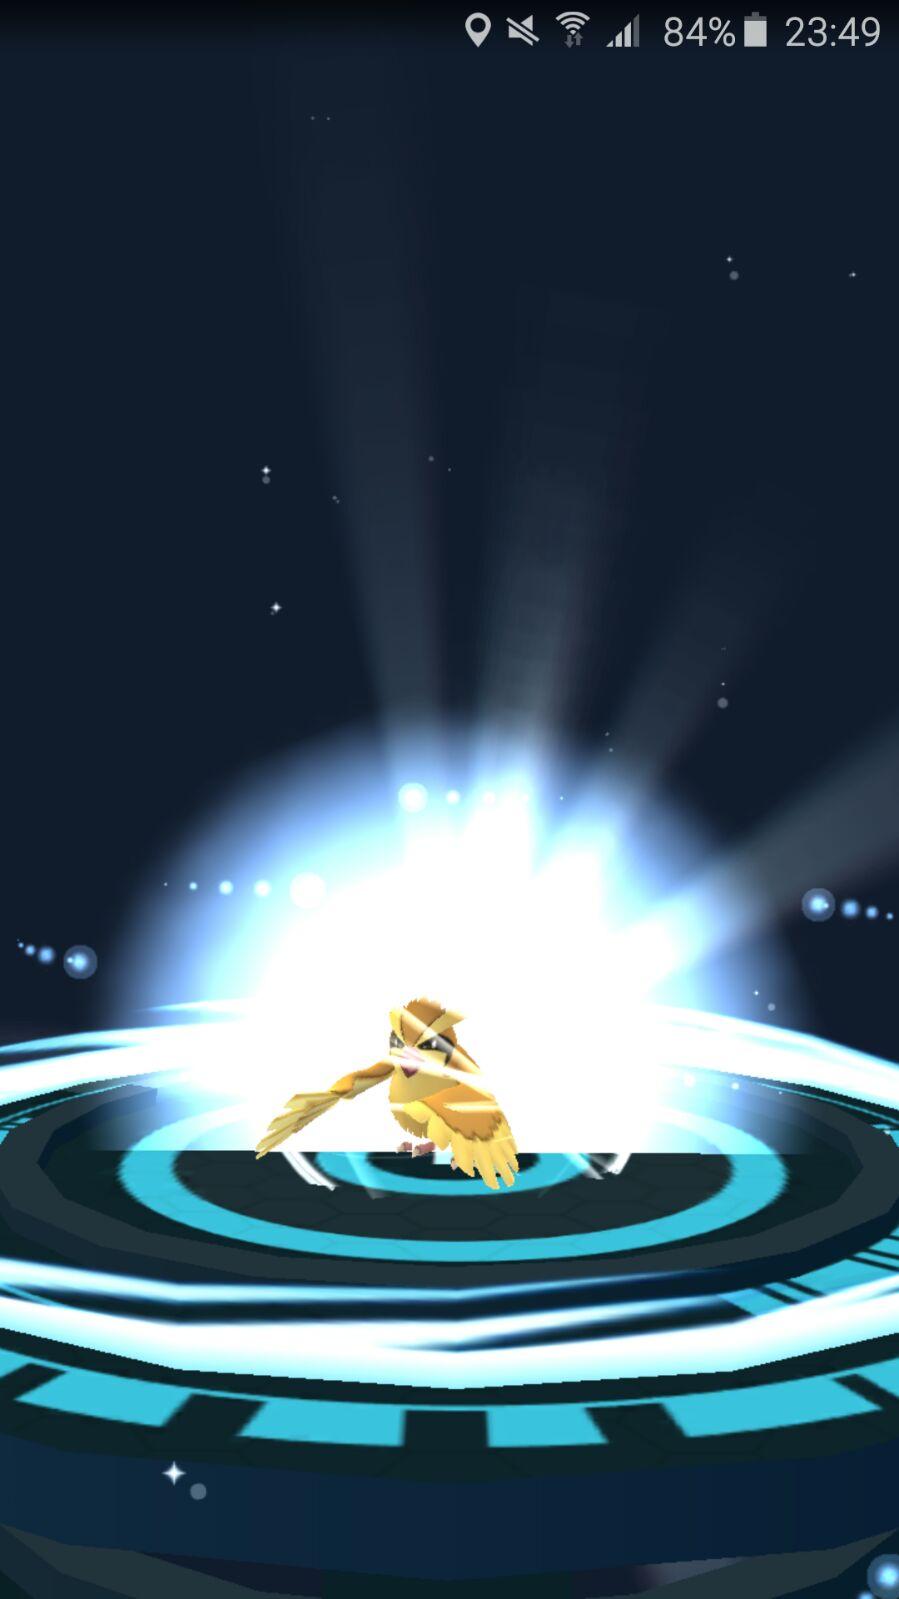 Pokémon entwickeln